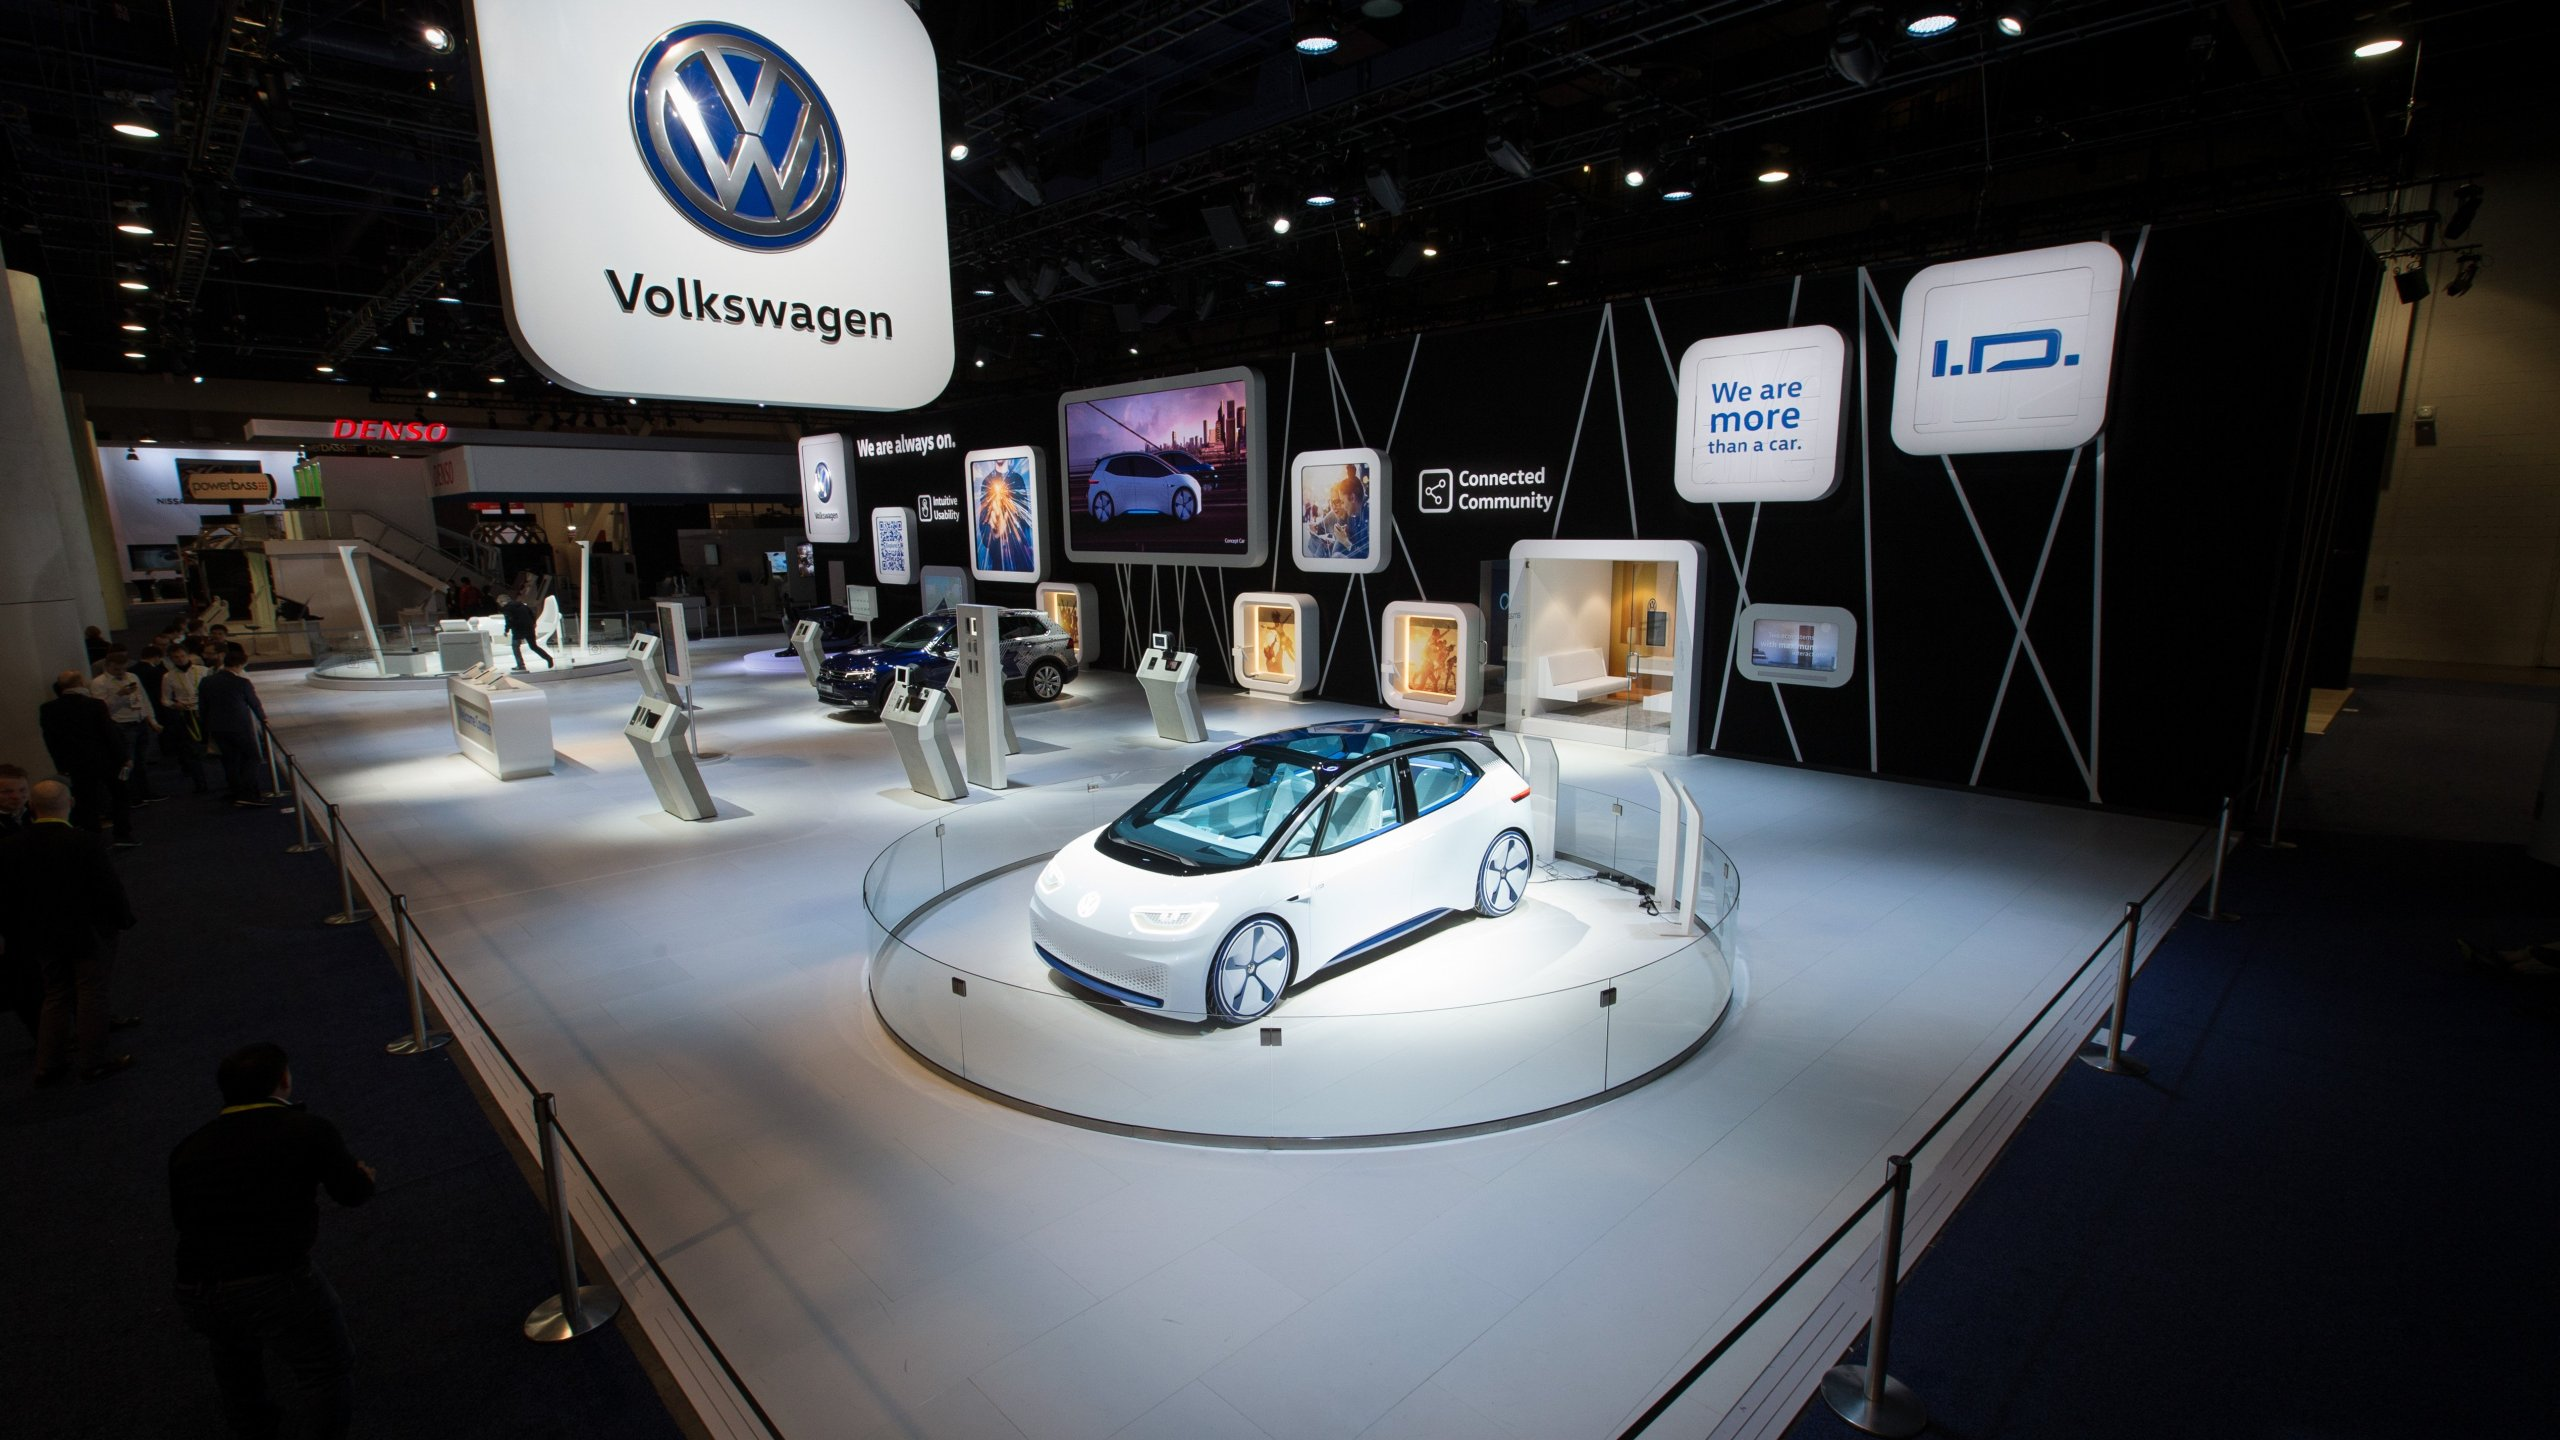 A Volkswagon car at CES in 2017. (Credit: Friso Gentsch/Volkswagen)